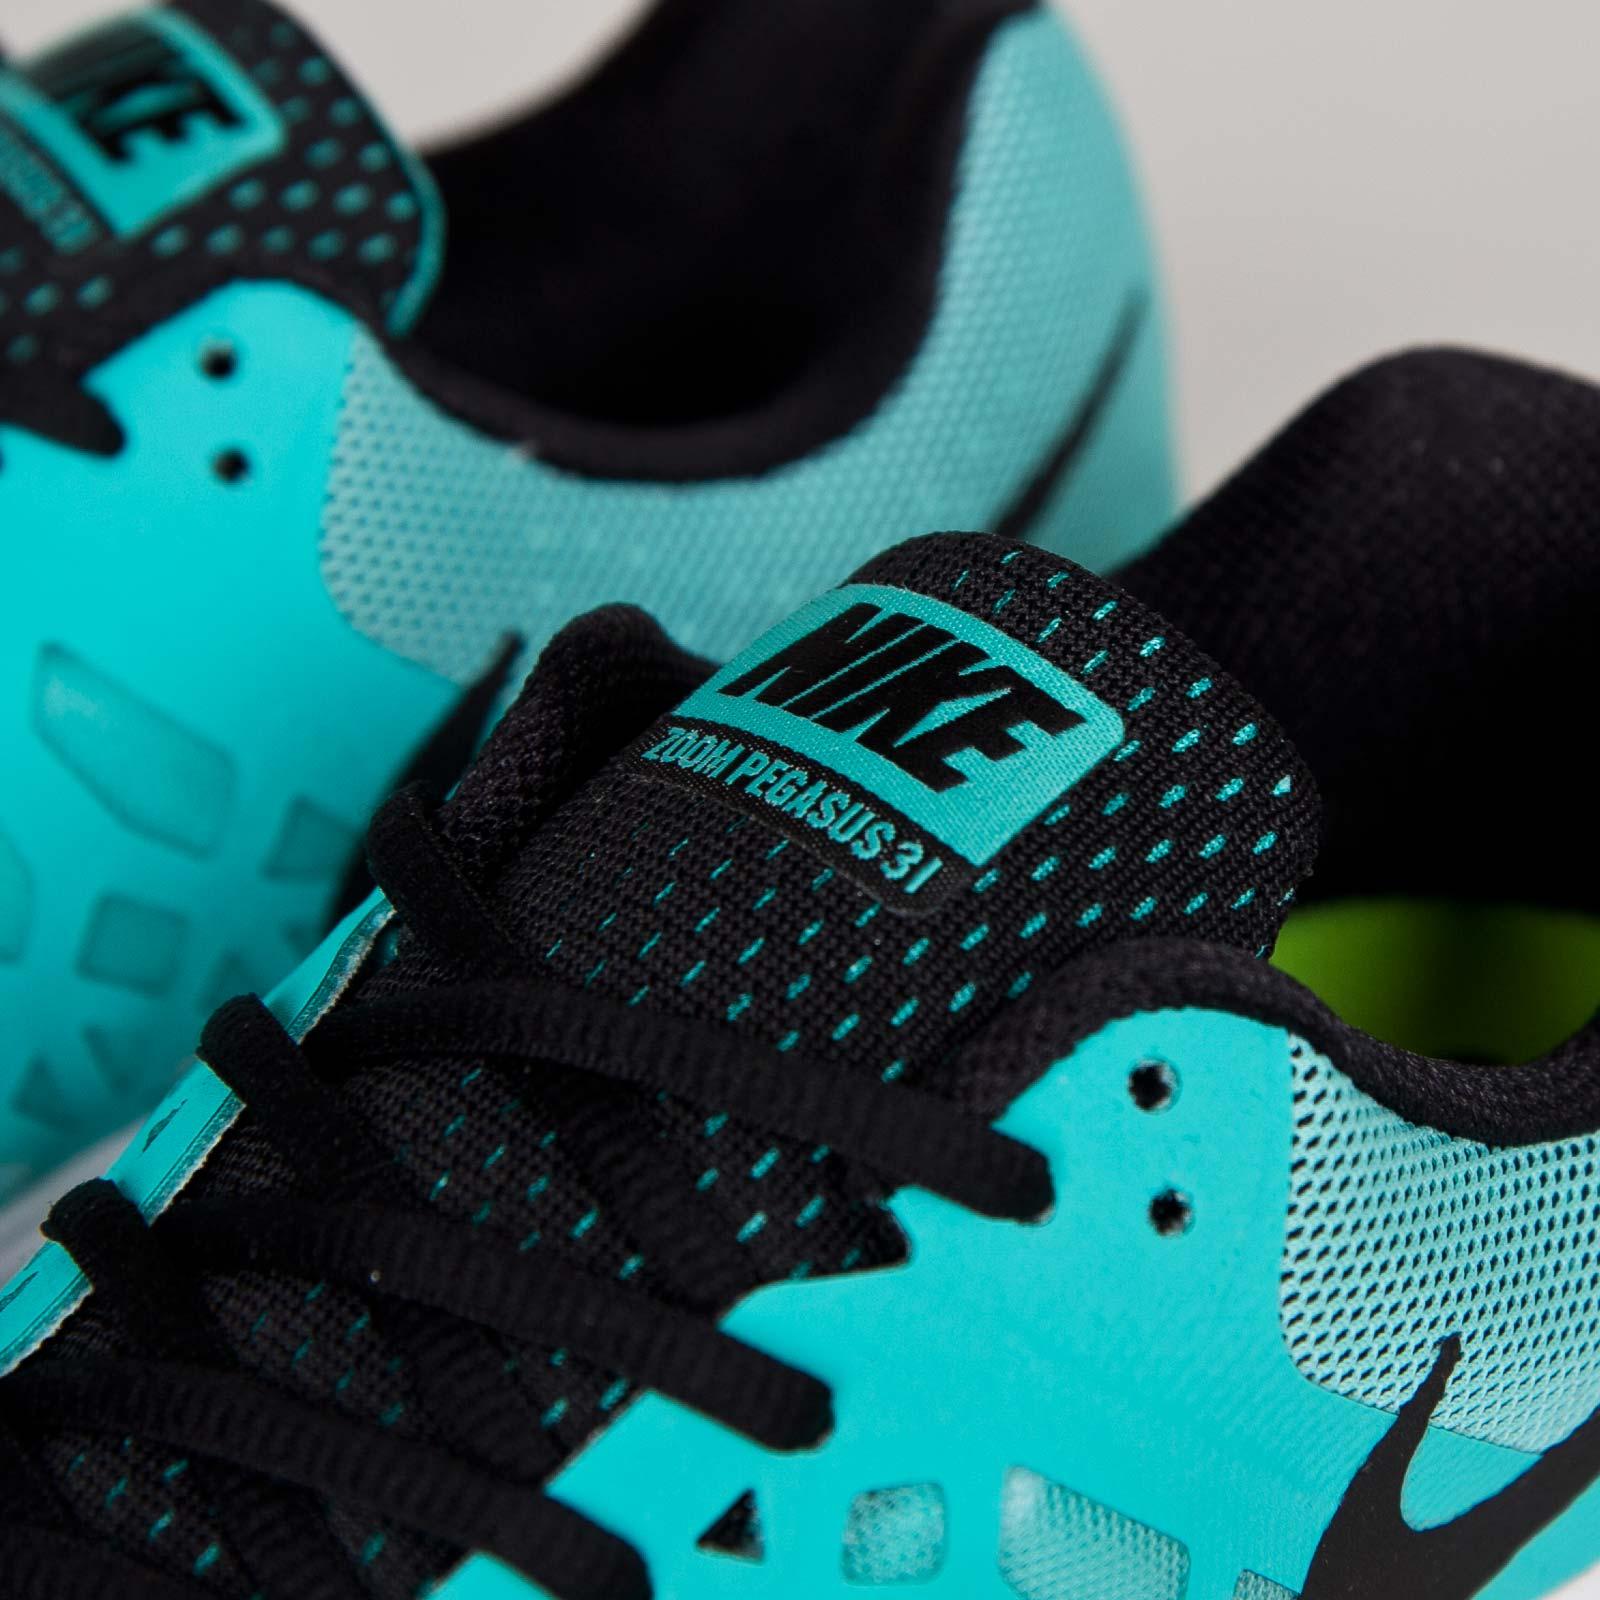 sale retailer 7dc54 36de8 Nike Air Zoom Pegasus 31 - 652925-405 - Sneakersnstuff ...